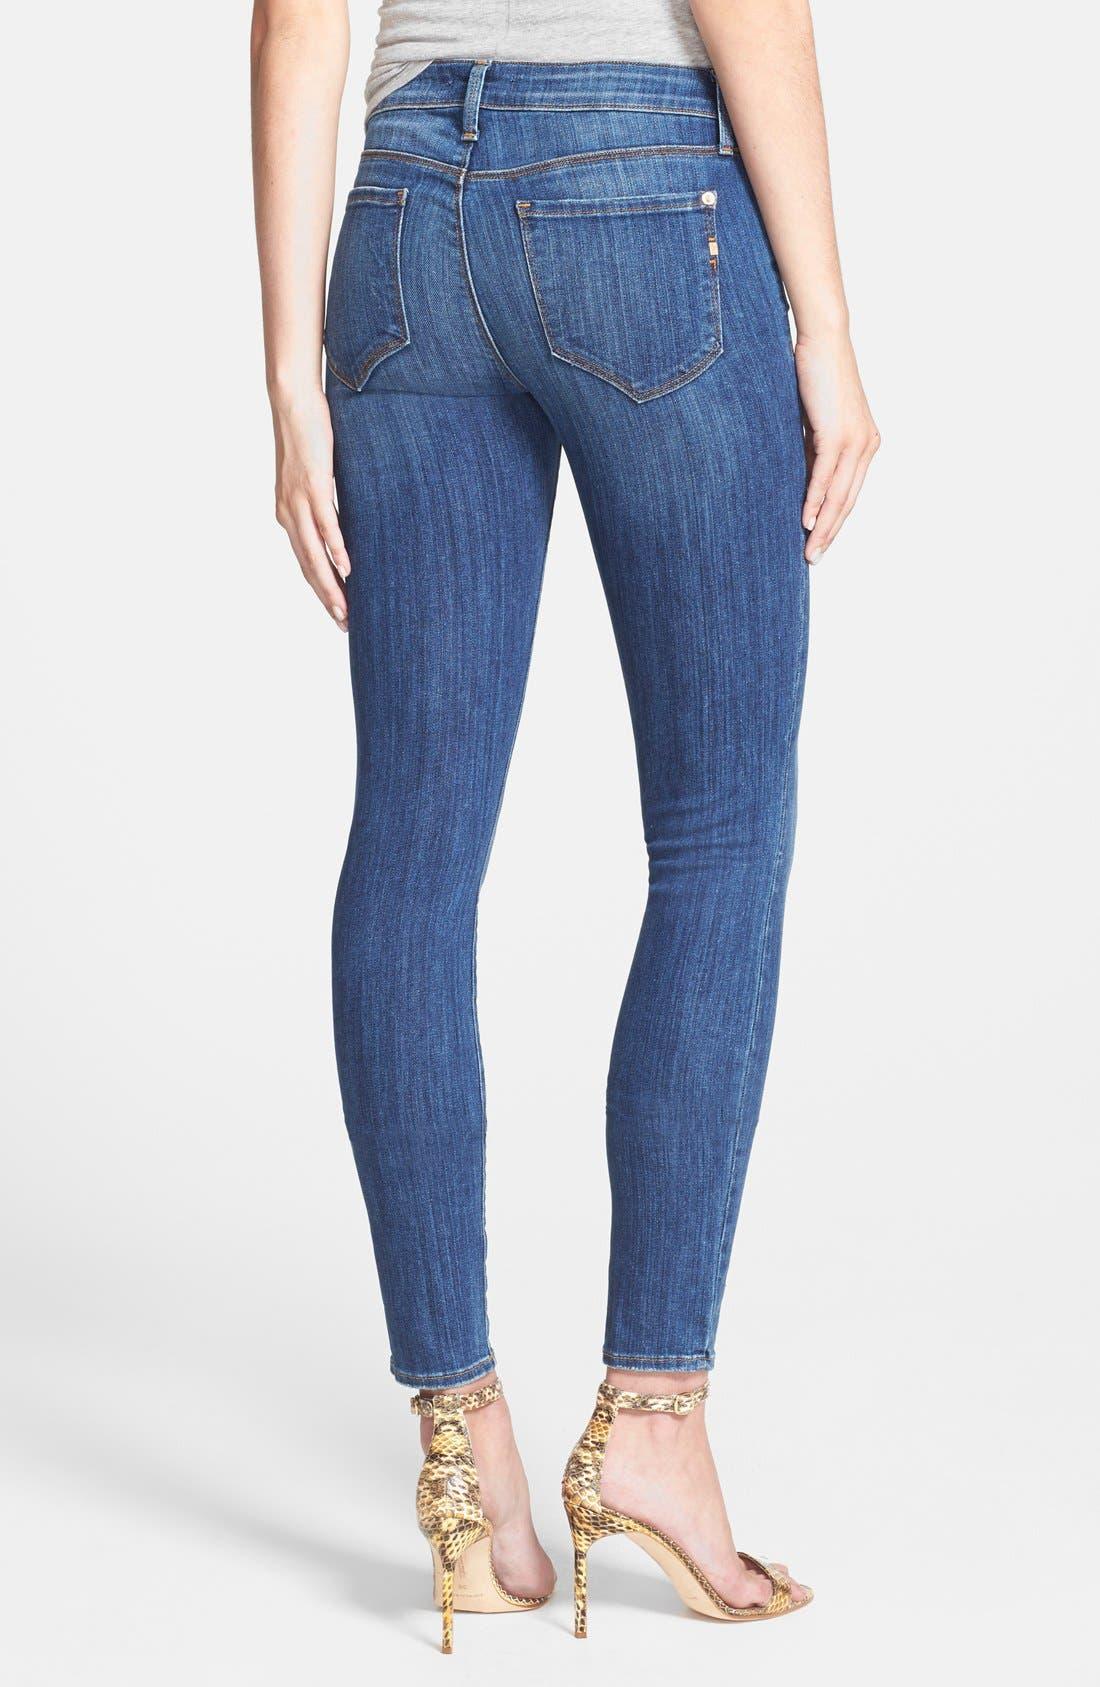 Alternate Image 2  - Genetic 'Stem' Mid Rise Skinny Jeans (Arena)